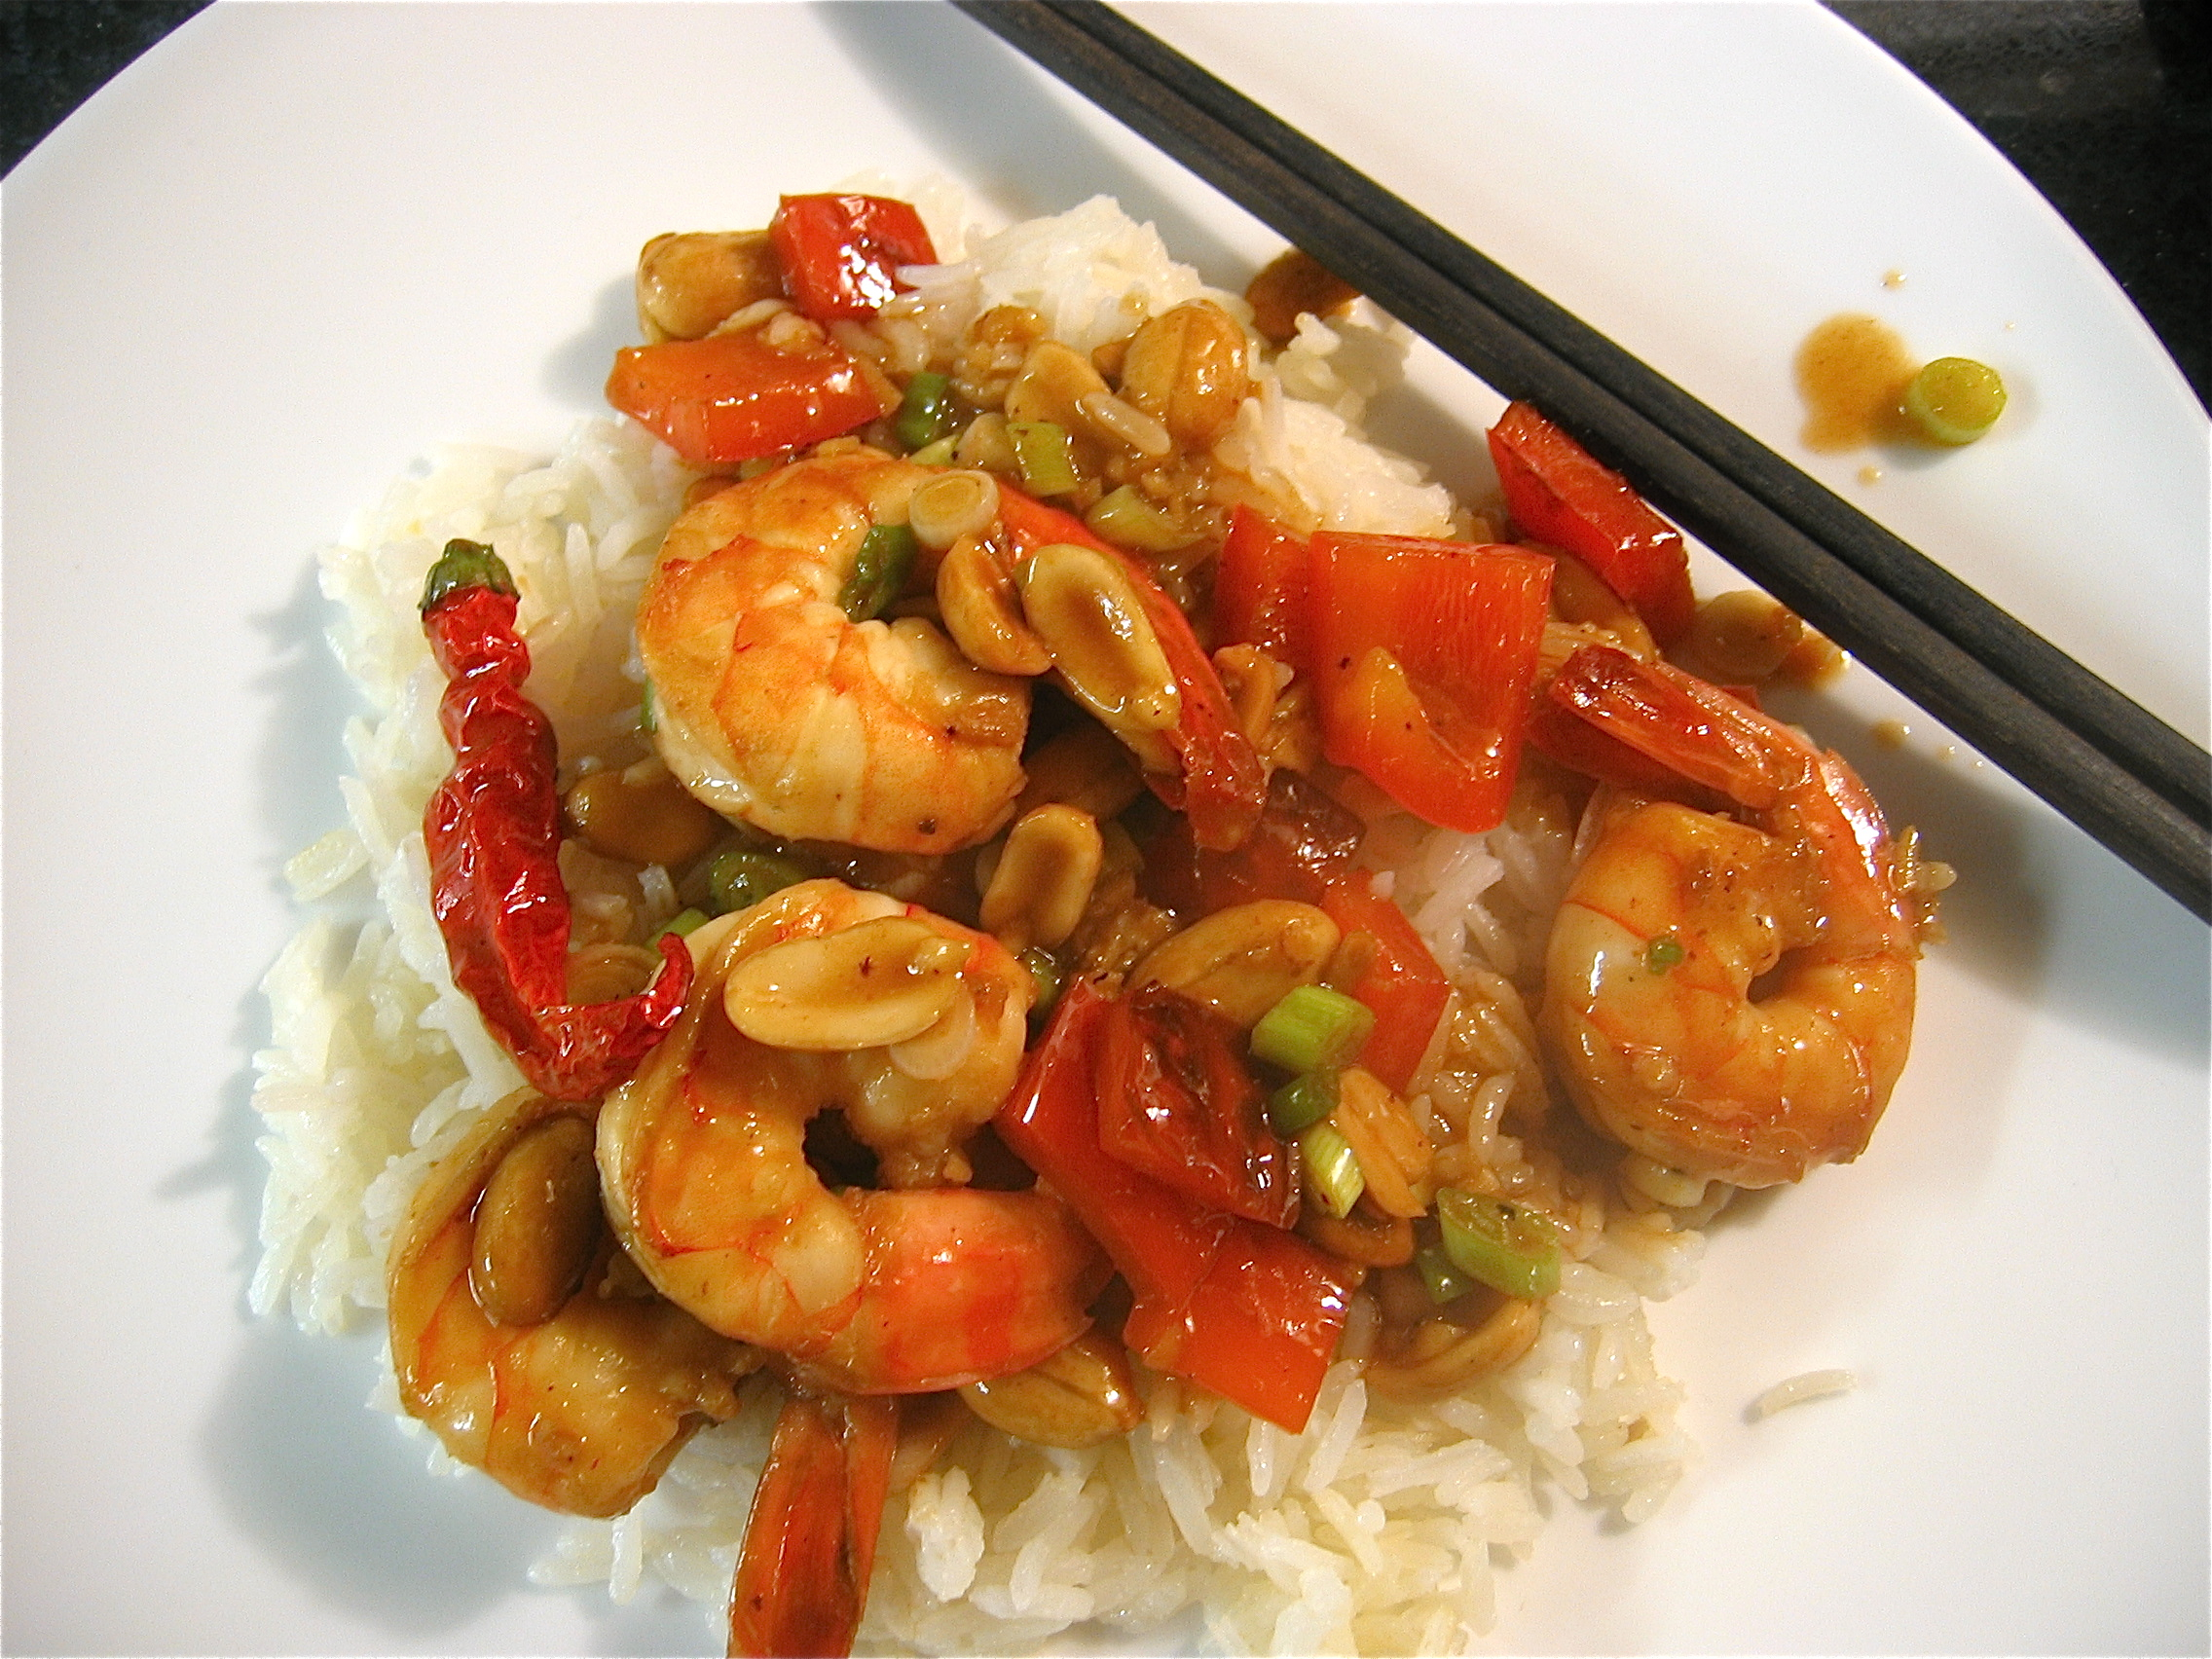 kung pao shrimp 5 kung pao shrimp sybaritica kung pao shrimp kung pao ...